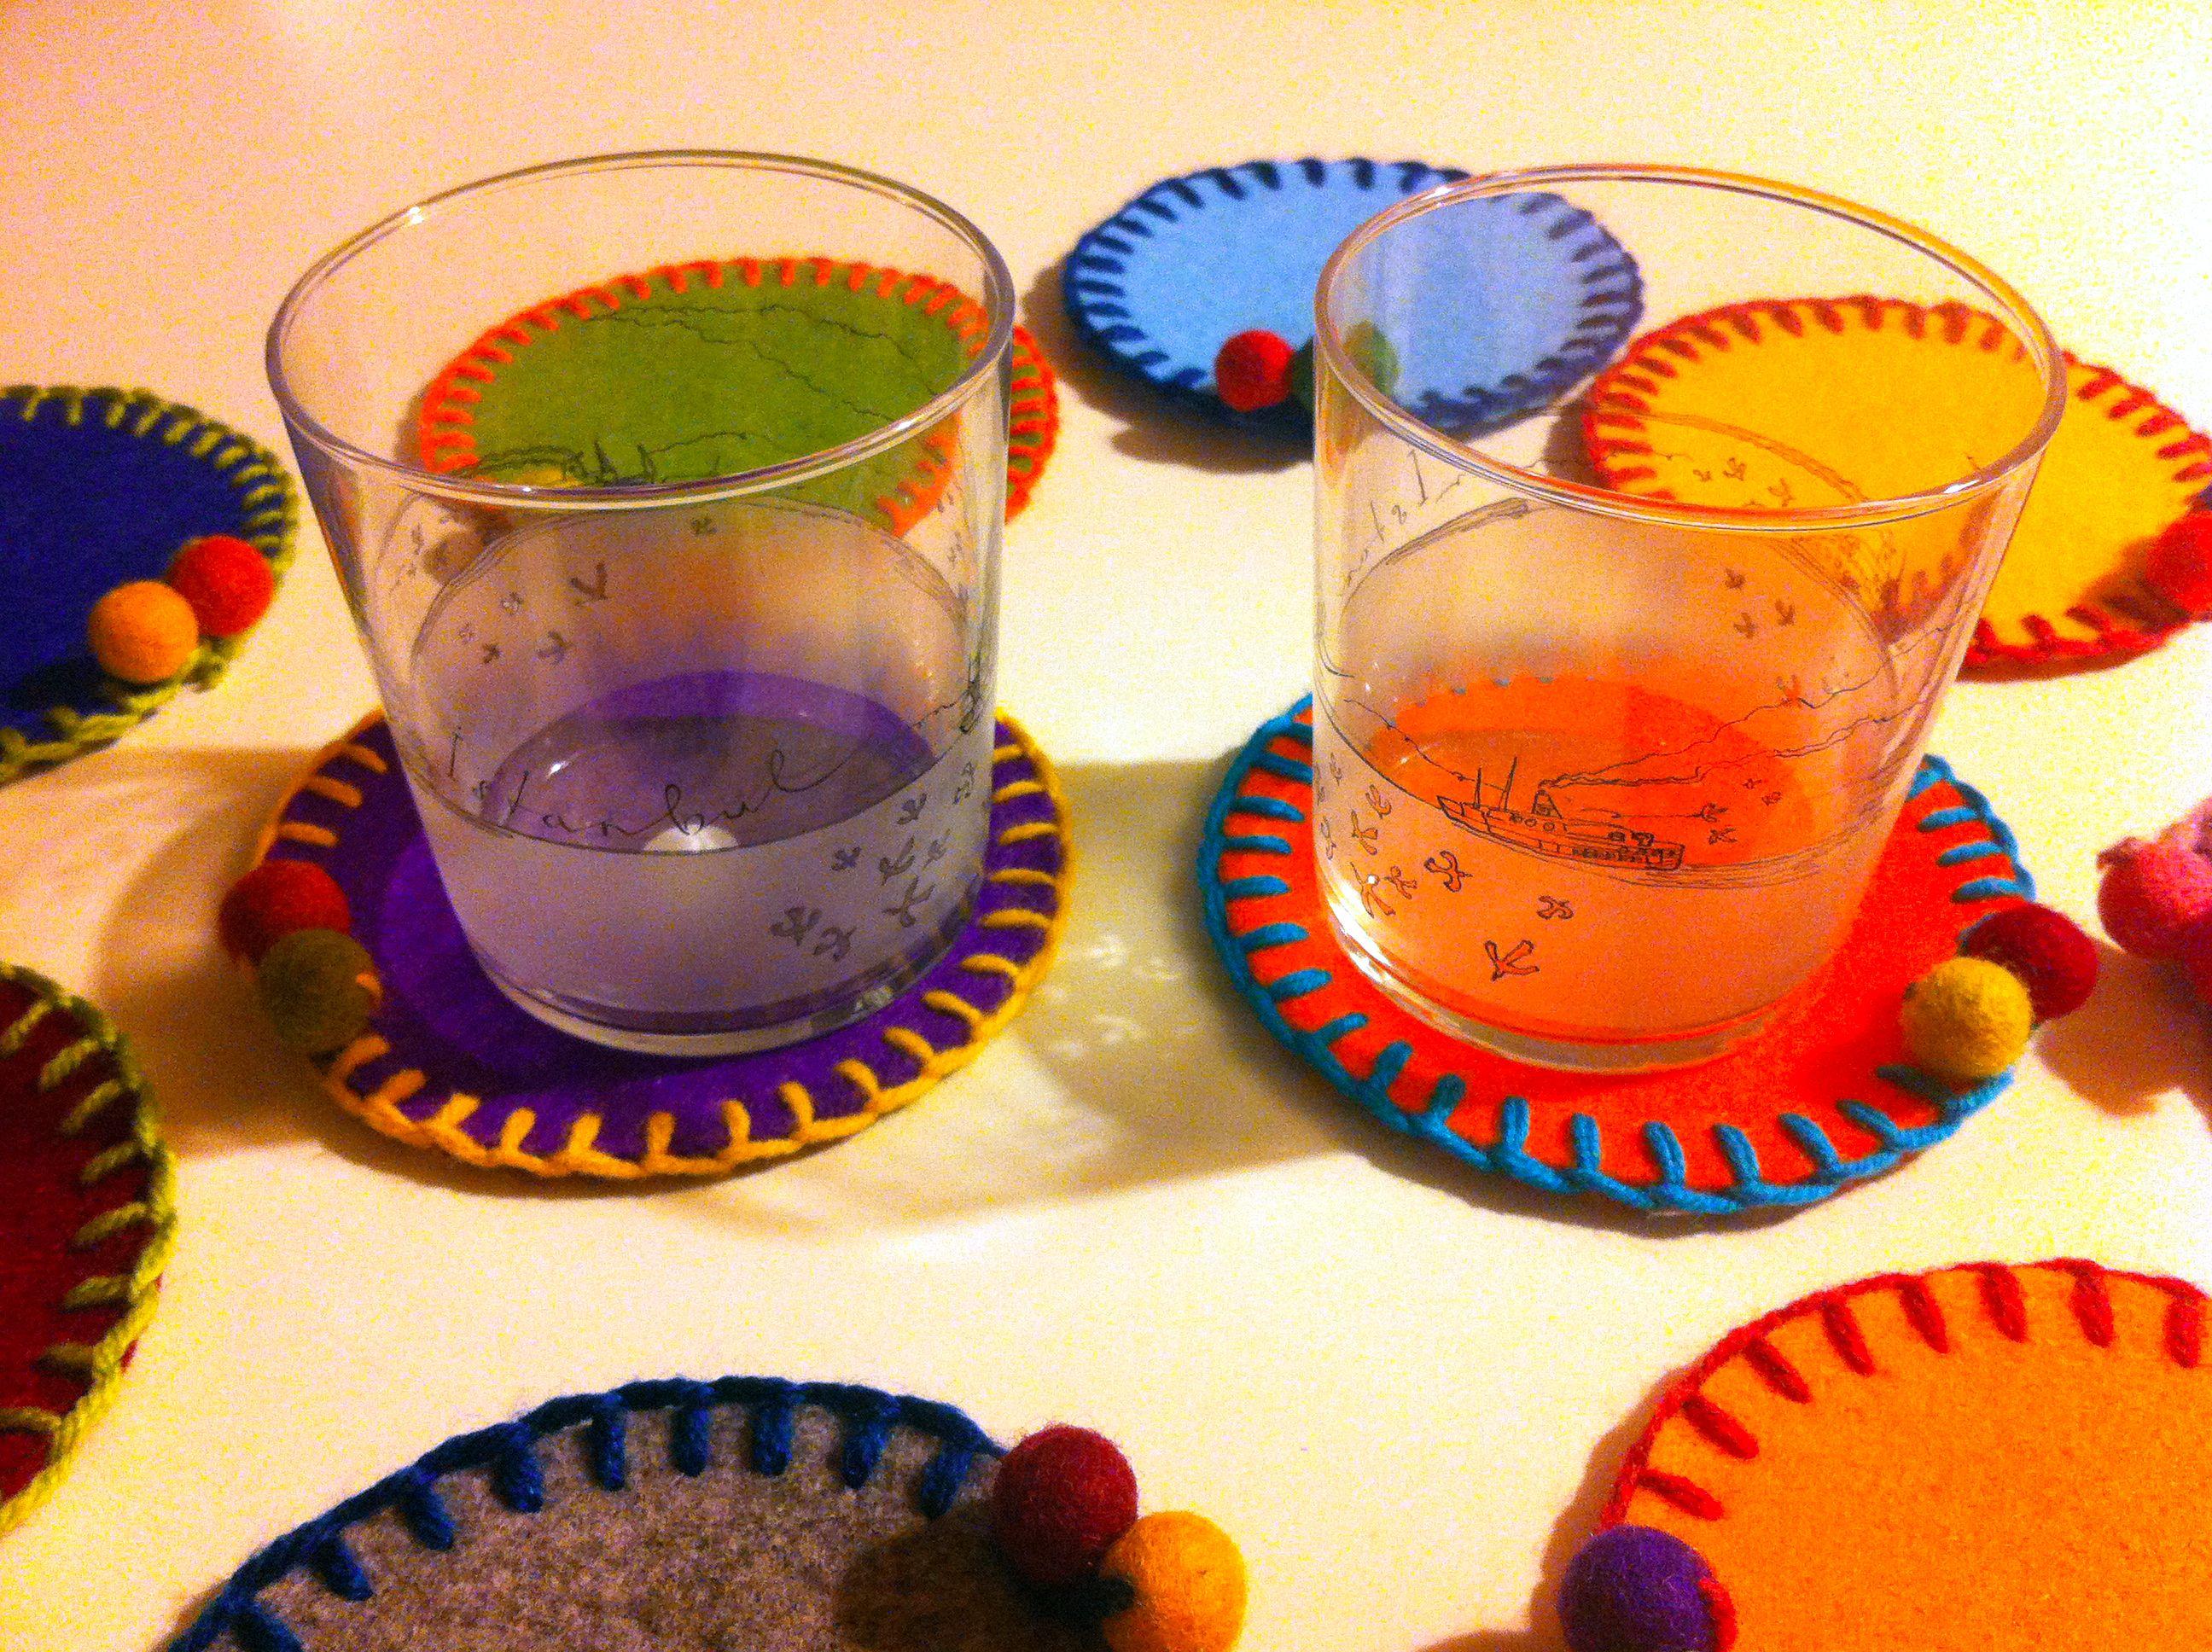 keçe bardak altlığı felt glass mat